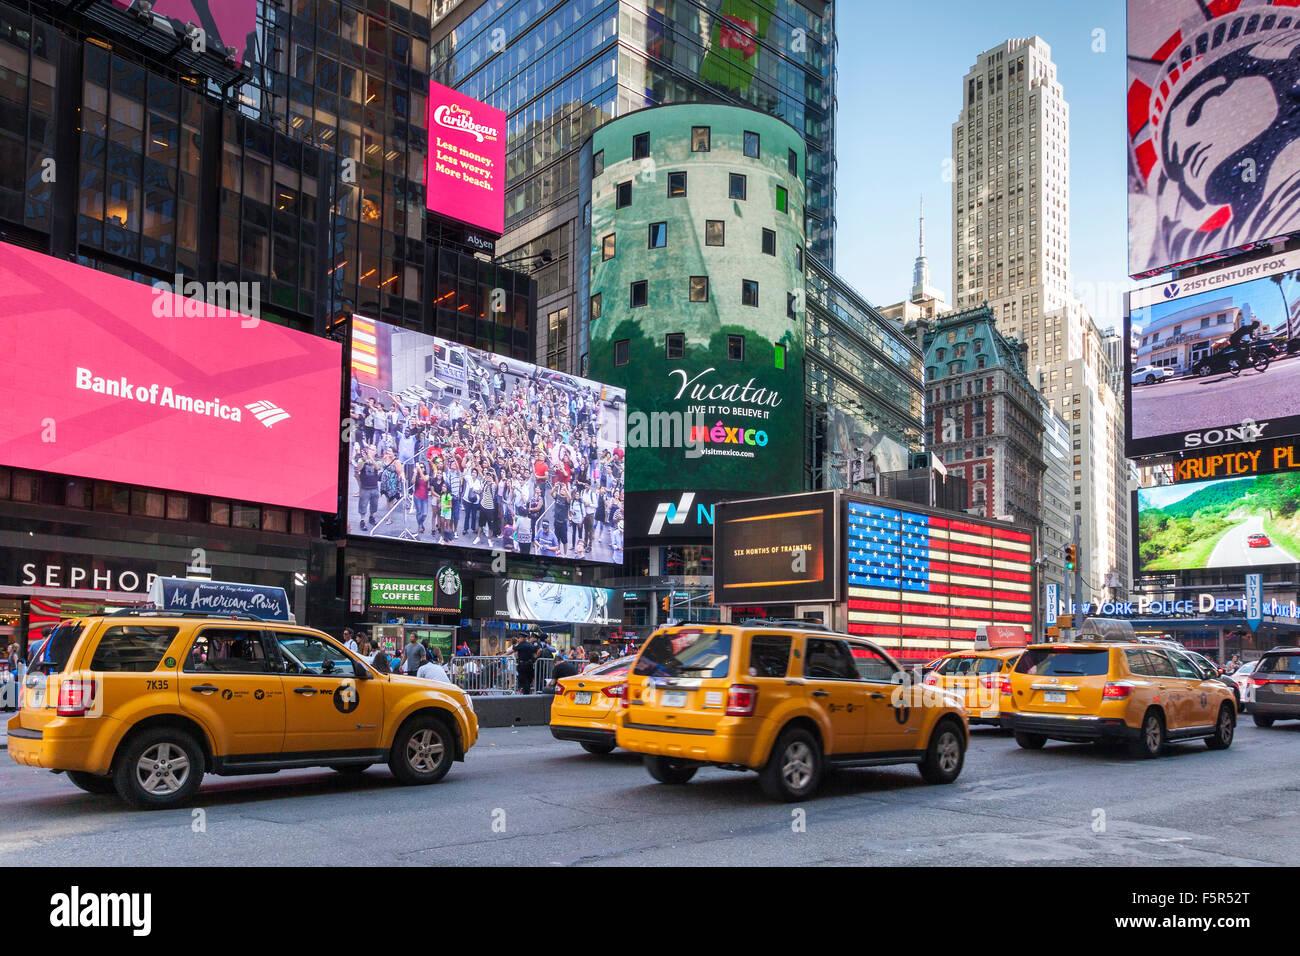 Times Square, midtown Manhattan, New York, USA - Stock Image